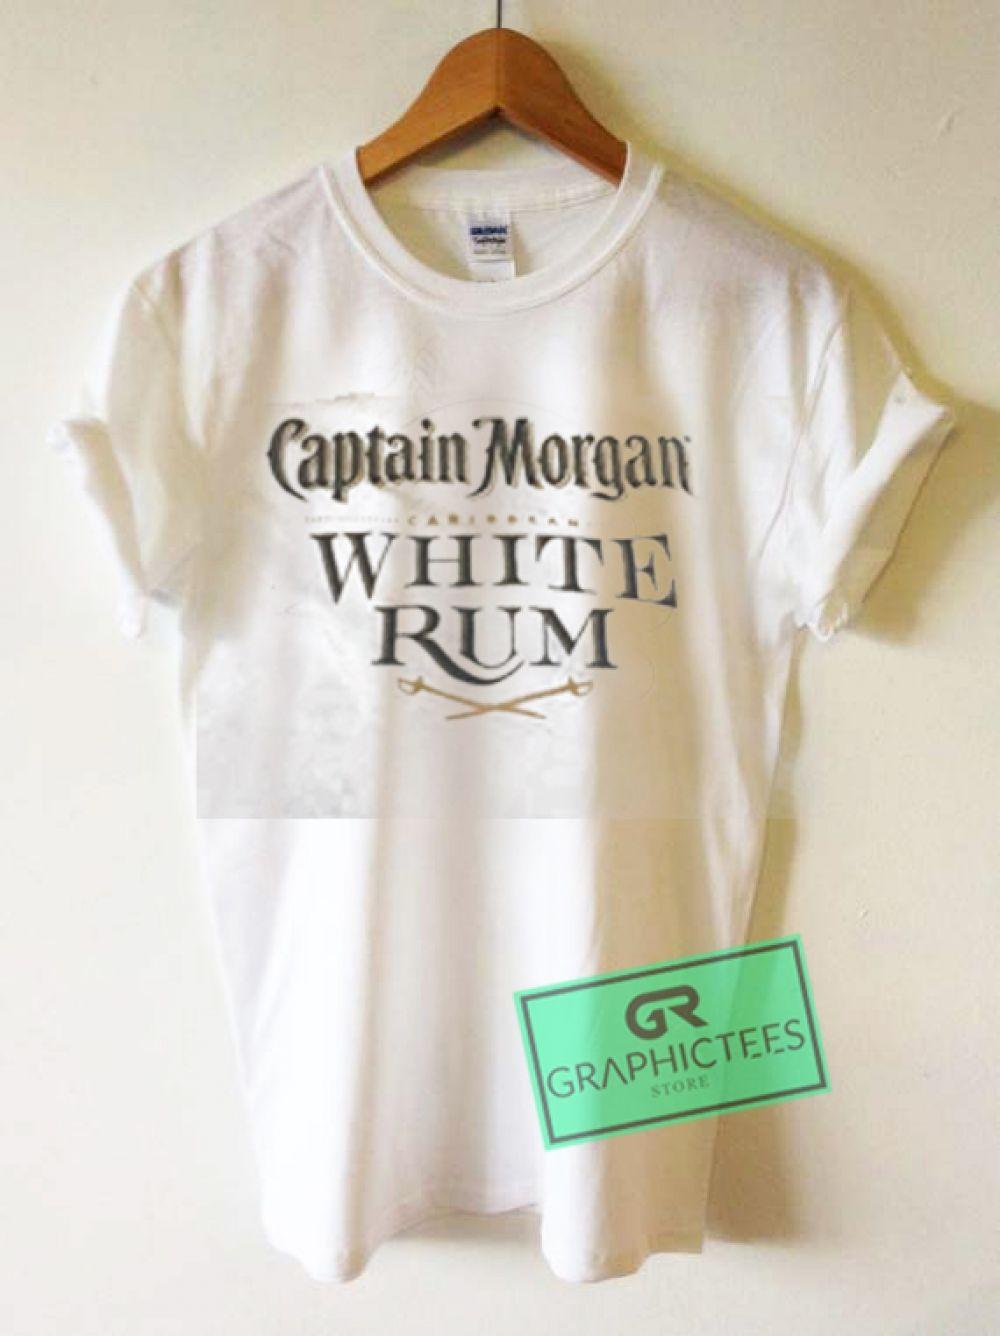 d2c6d84073584 Captain Morgan Caribbean White Rum Graphic Tees Shirts   Price   13.50